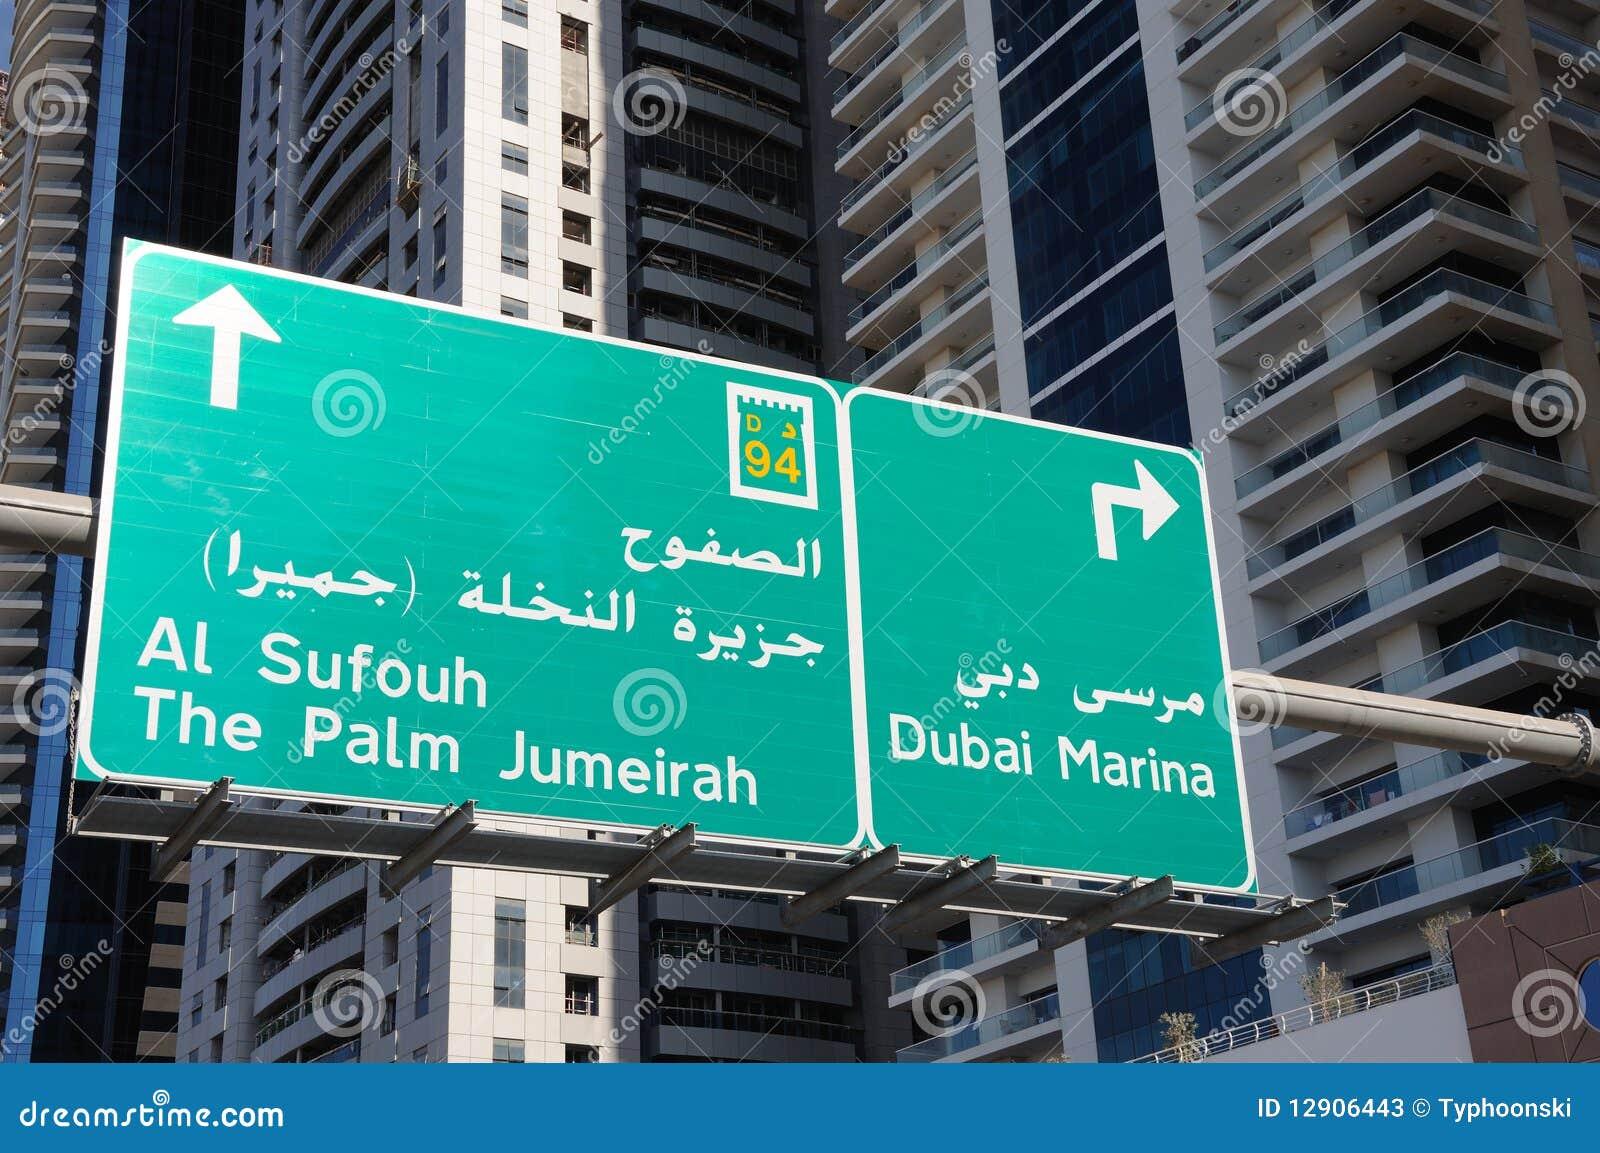 Street Sign in Dubai